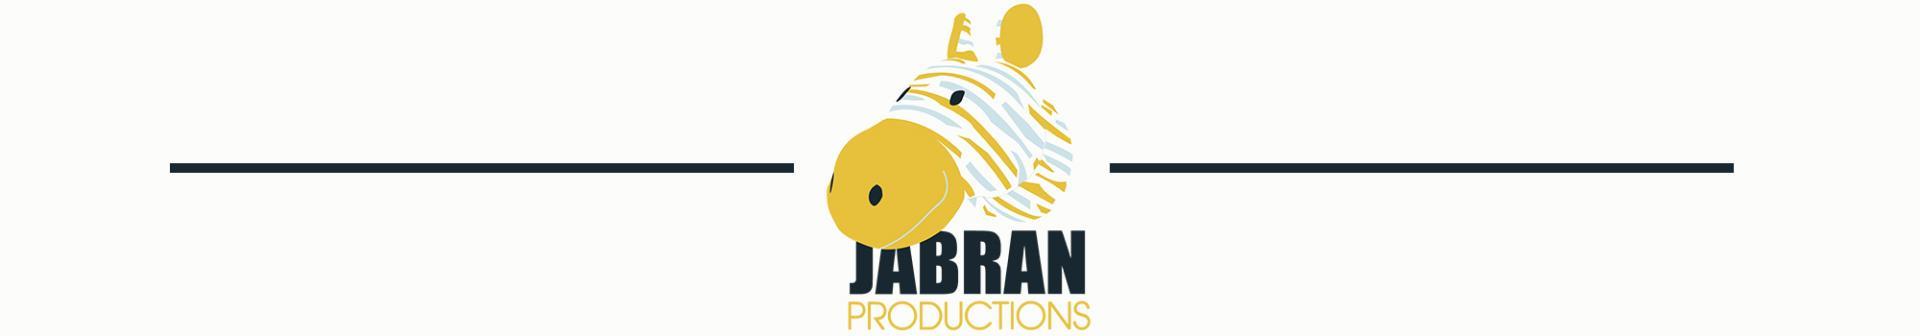 Jabran Productions : Adhésions 2016 - JABRAN PRODUCTIONS